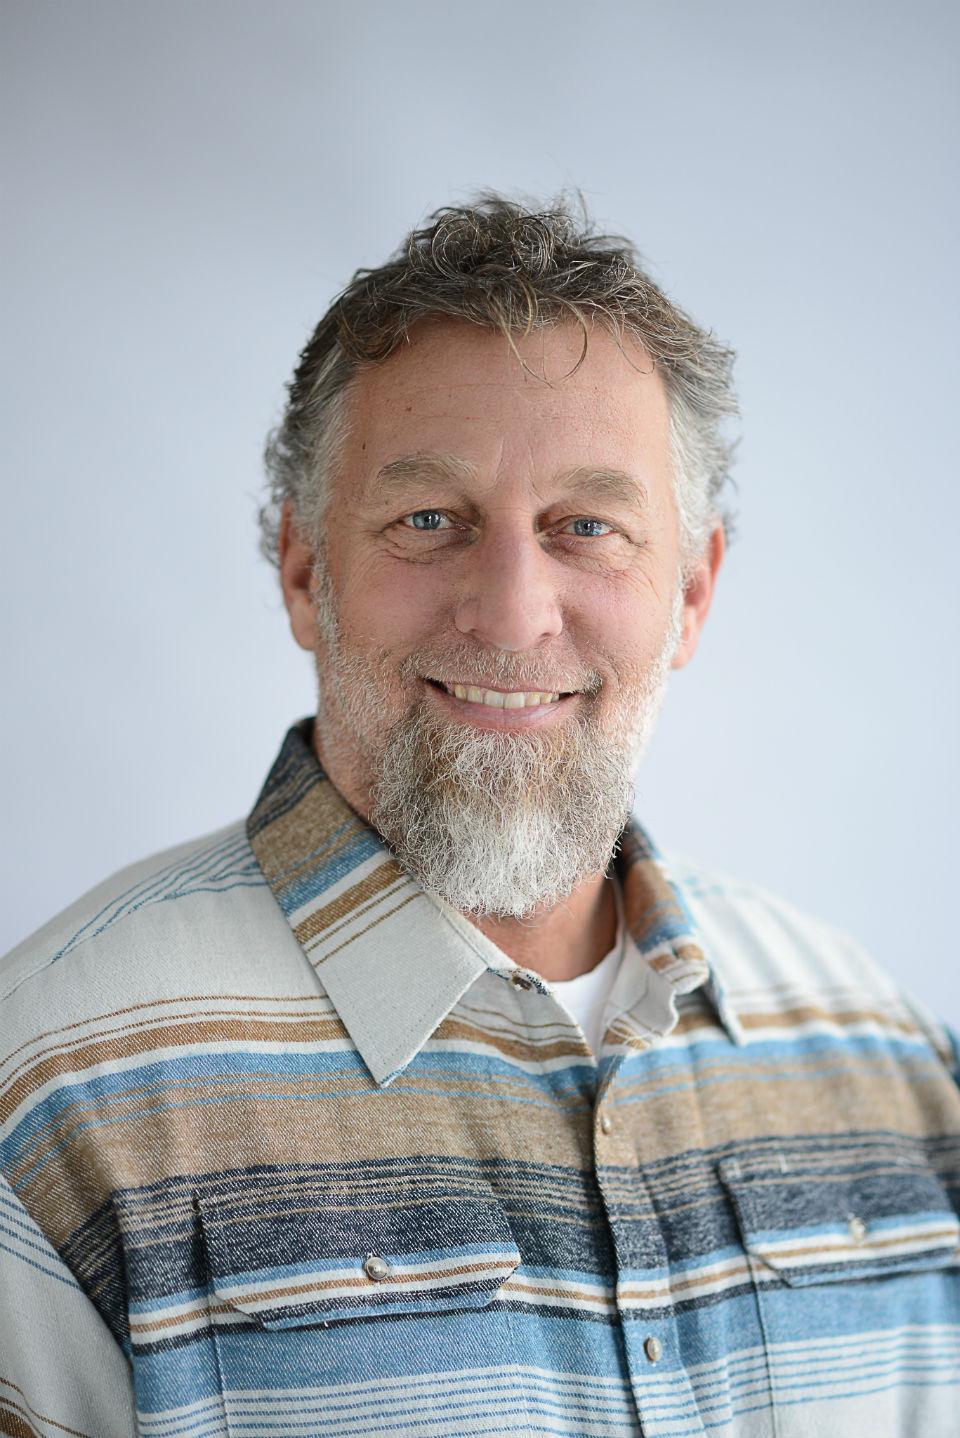 Jim Manfred